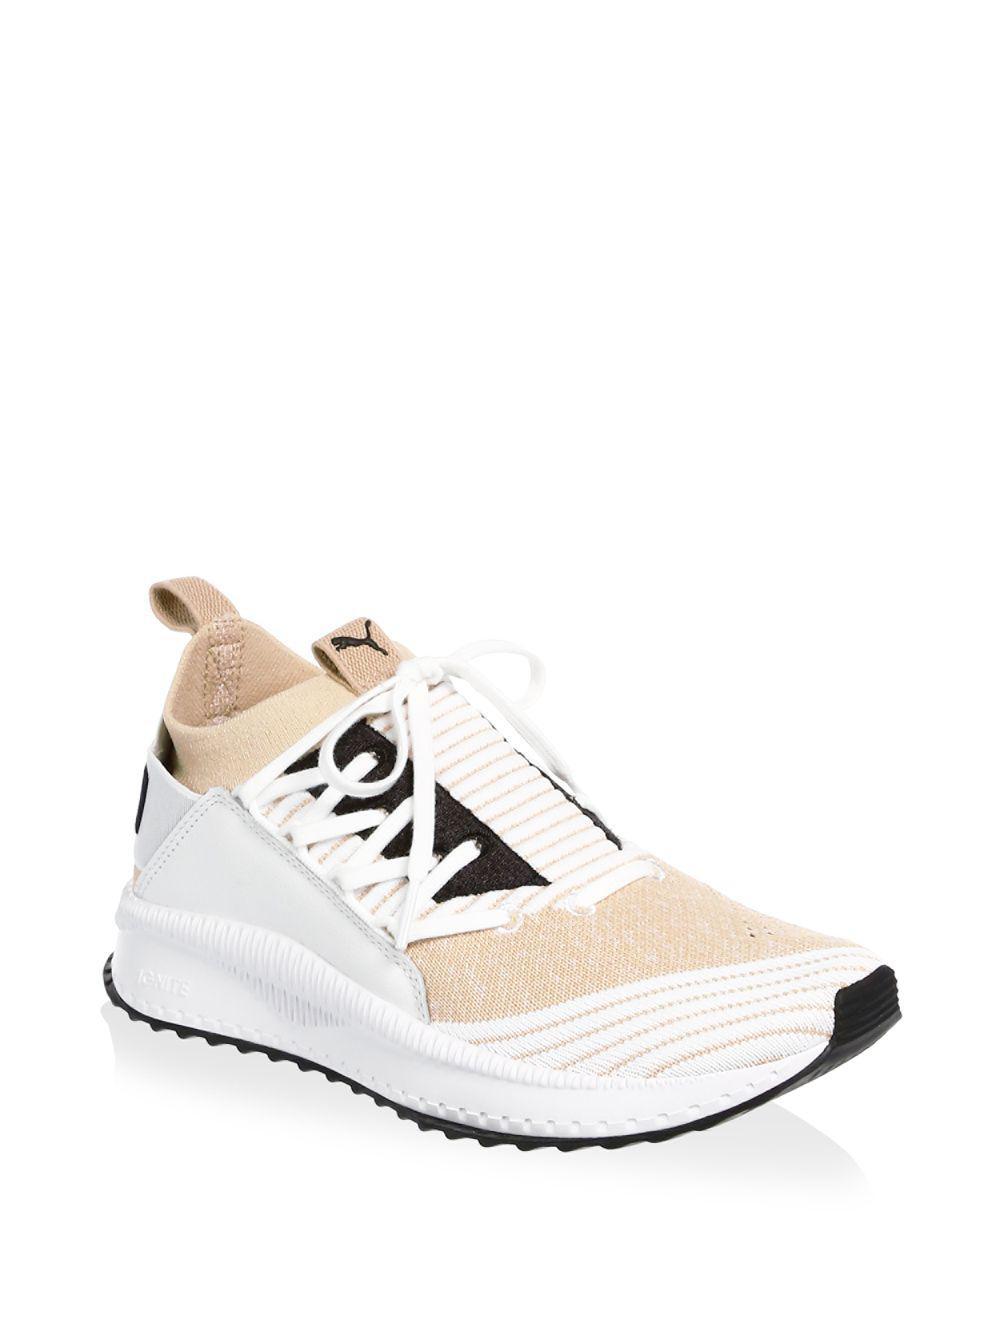 PUMA Tsugi Shinseiknit Fabric Logo Running Sneakers - Save 30% - Lyst bac7a65a5